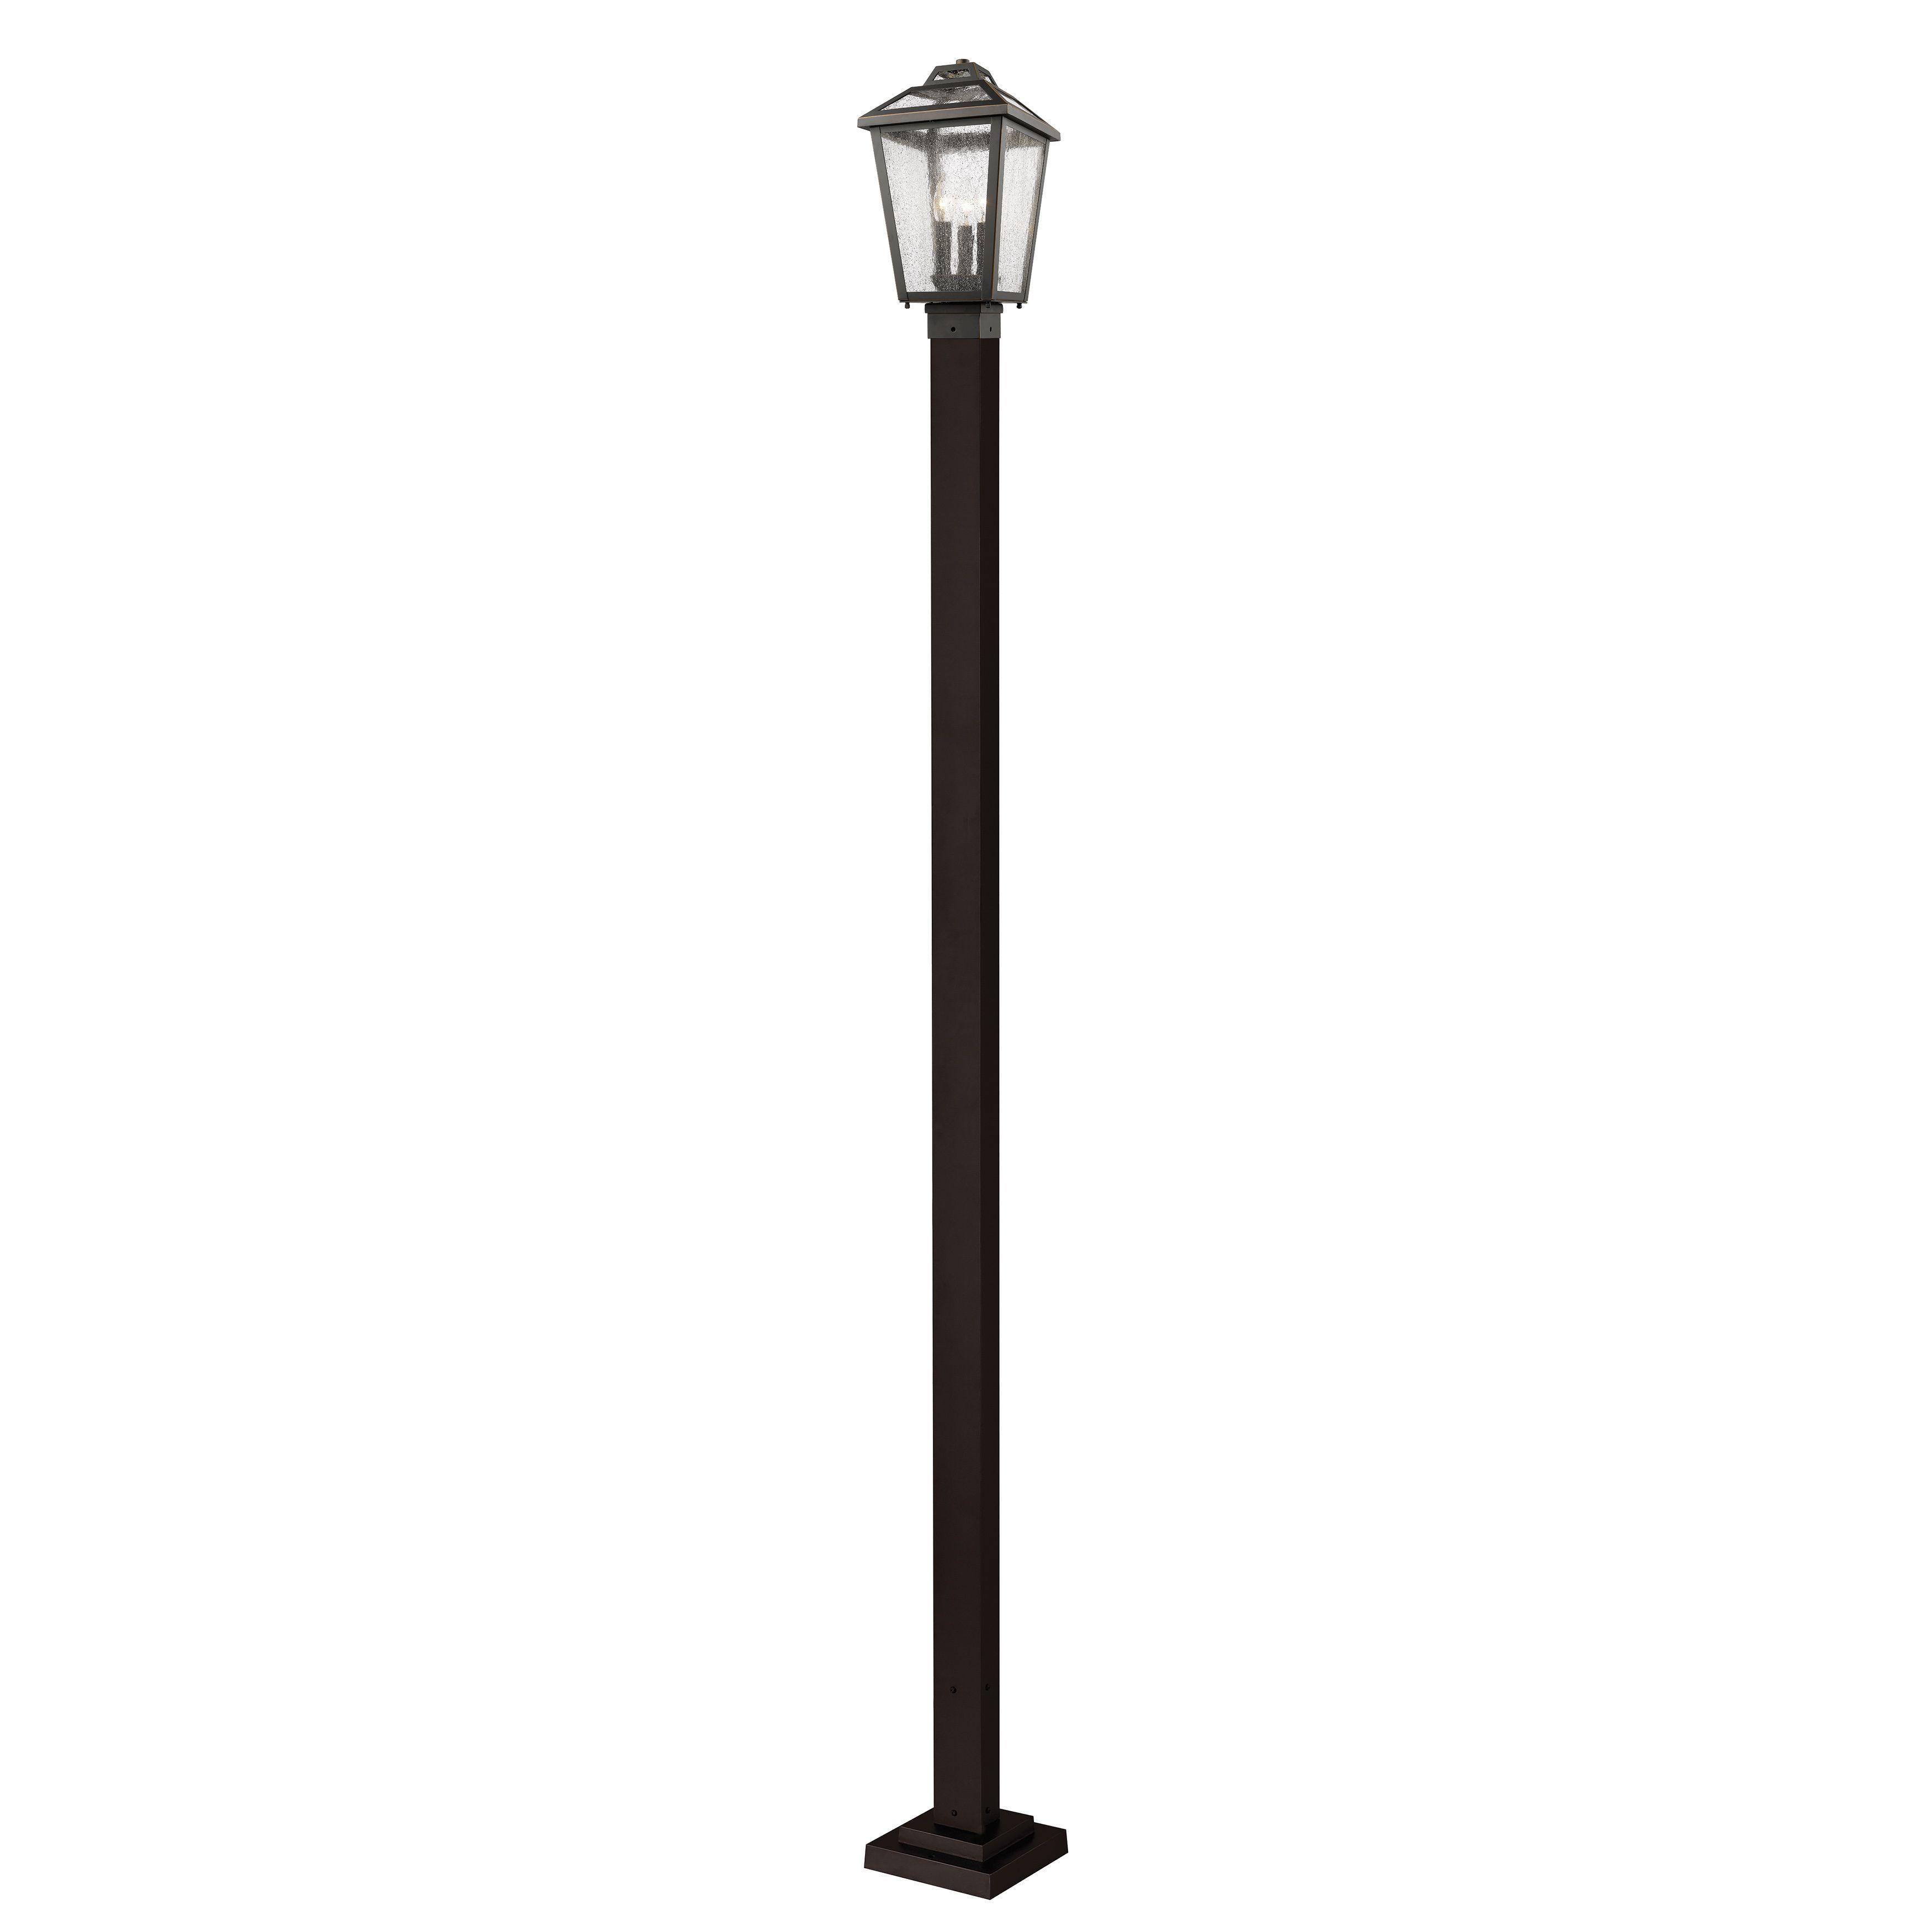 outdoor pole ideas design homezanin smart decorating gallant solar image pleasing lights lamps garden remodeling post dk lamp